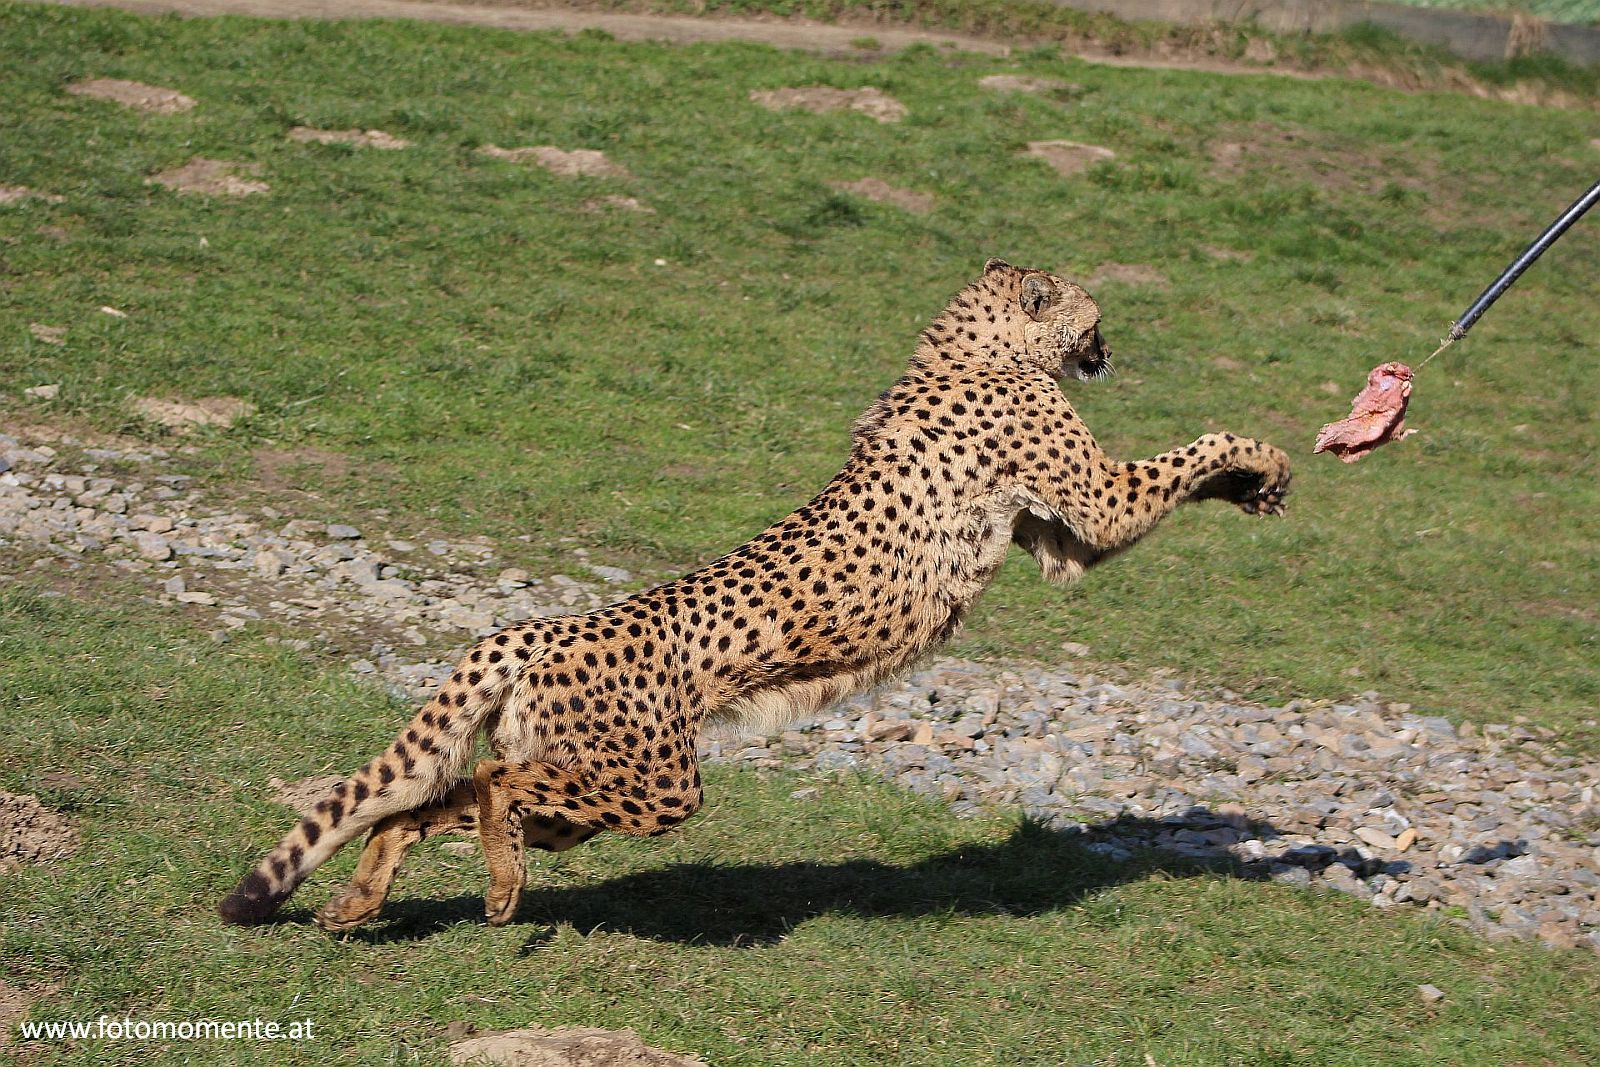 gepard beute jagen - Gepard beim Jagen seiner Beute